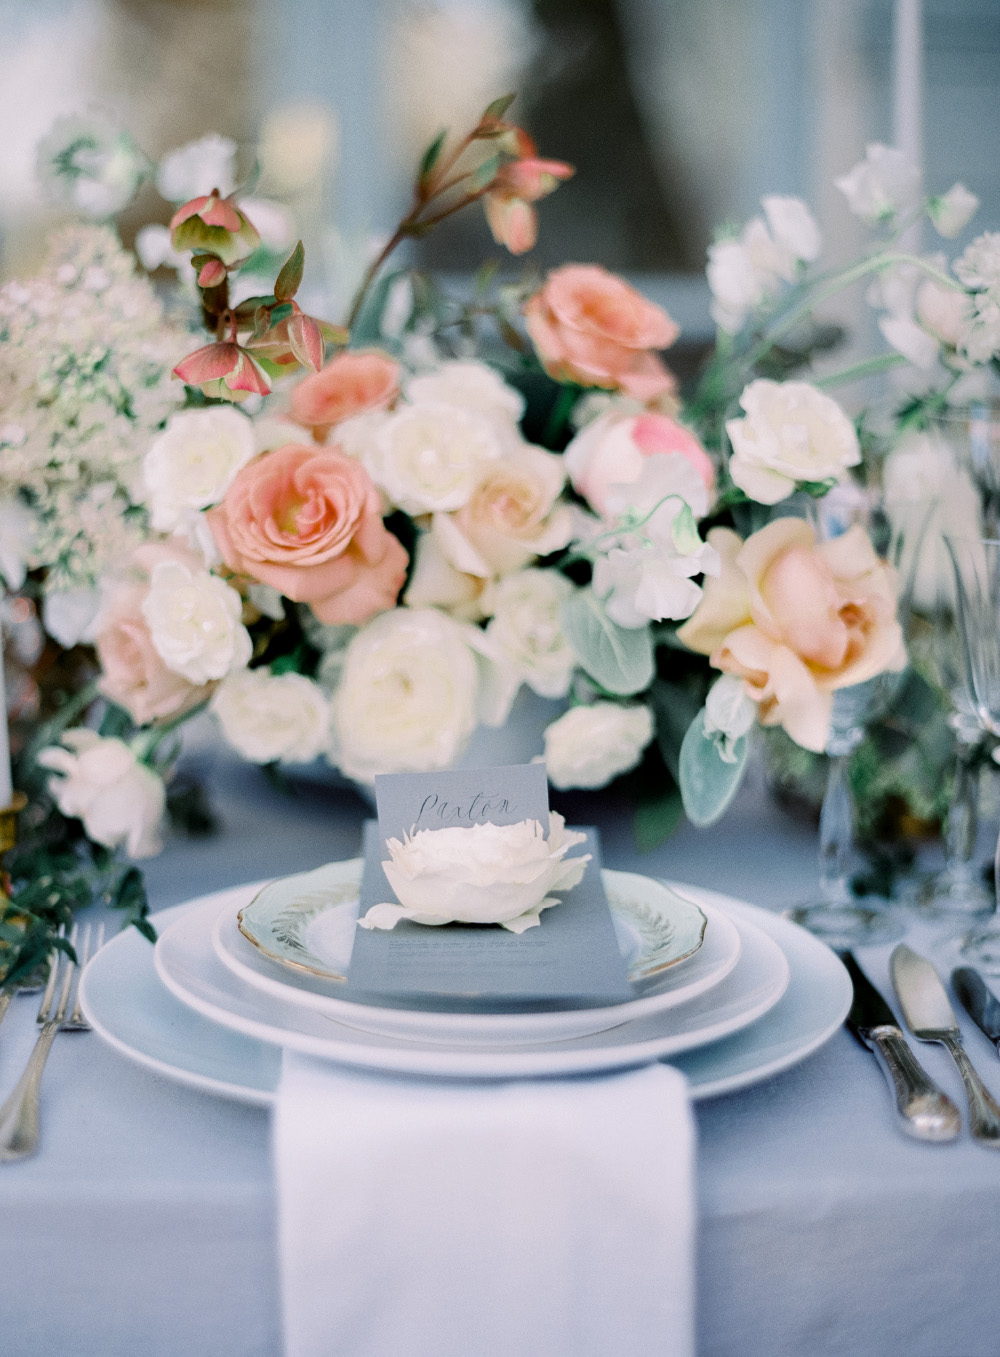 Provence Wedding Flowers, Tuscany Wedding Flowers, French Destination Wedding, Floral Designer, Florist France, Tuscany Florist, Provence Florist, Fine Art Wedding, Hochzeitsdekoration, Hochzeitsfloristik, Hochzeitsblumen, Zürich Hochzeit, Floristik, Dekoration, Styling, Floral Design